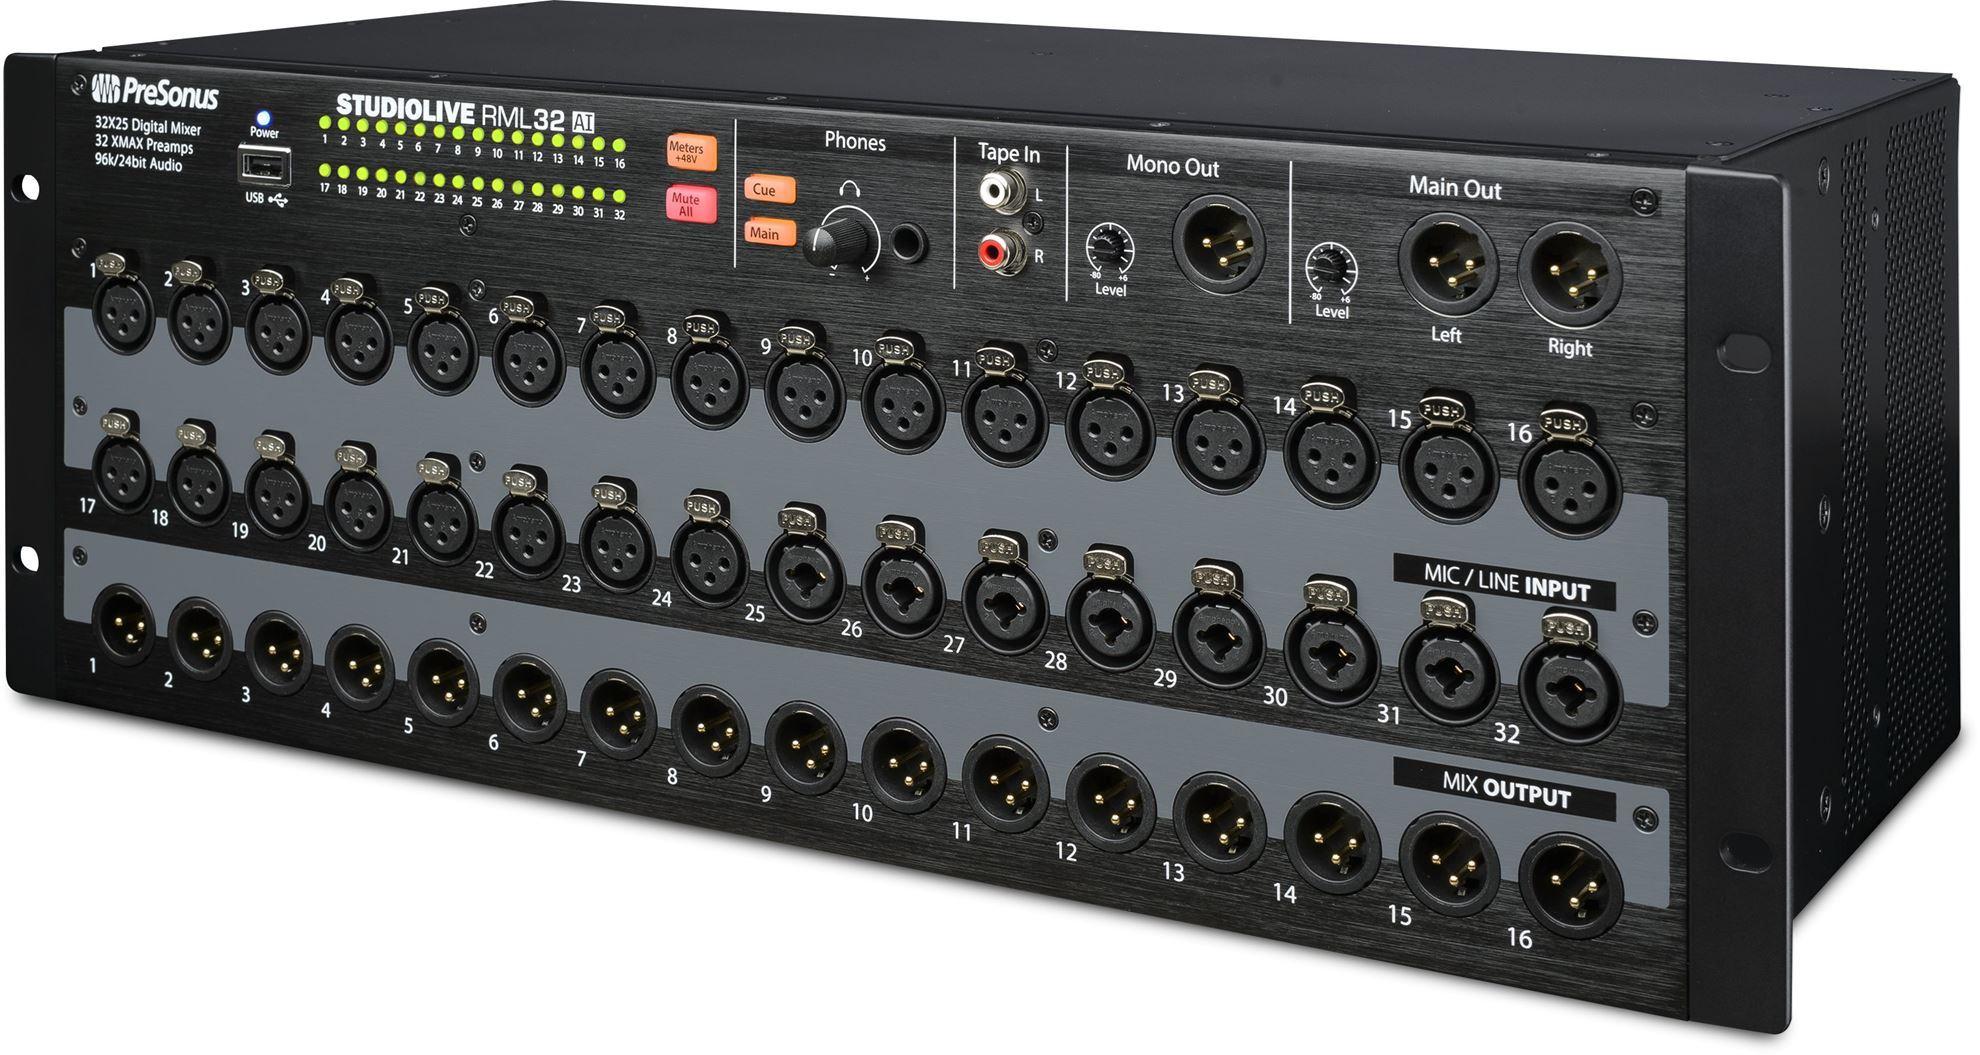 presonus rml32ai rack mount digital mixer 32 input perth mega music online. Black Bedroom Furniture Sets. Home Design Ideas